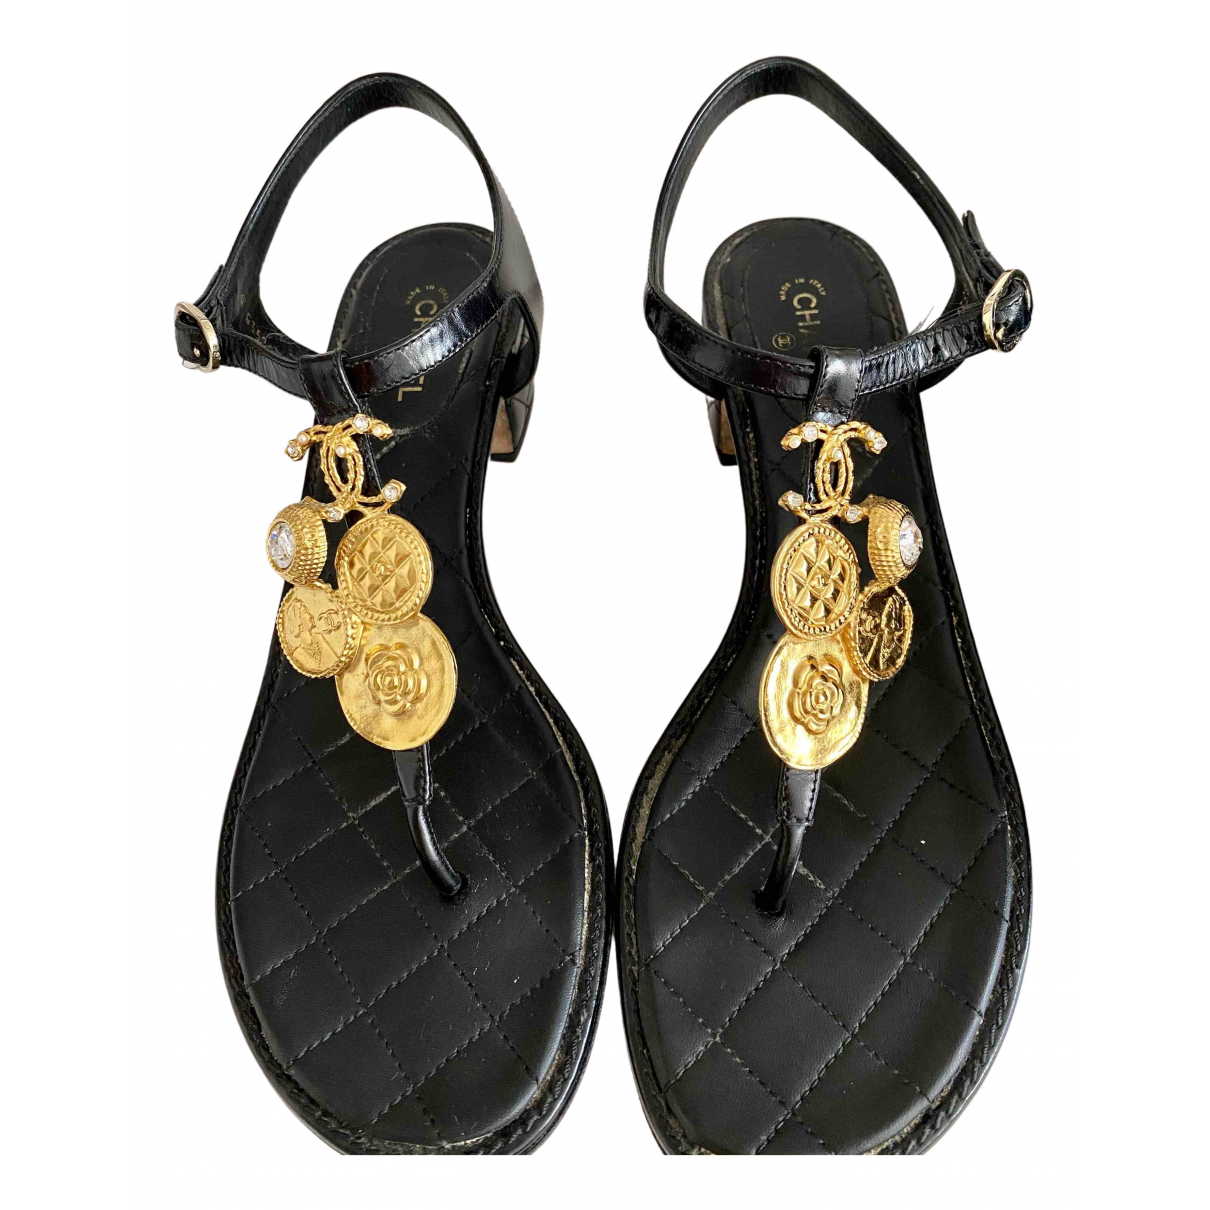 Chanel N Black Leather Sandals for Women 40 EU